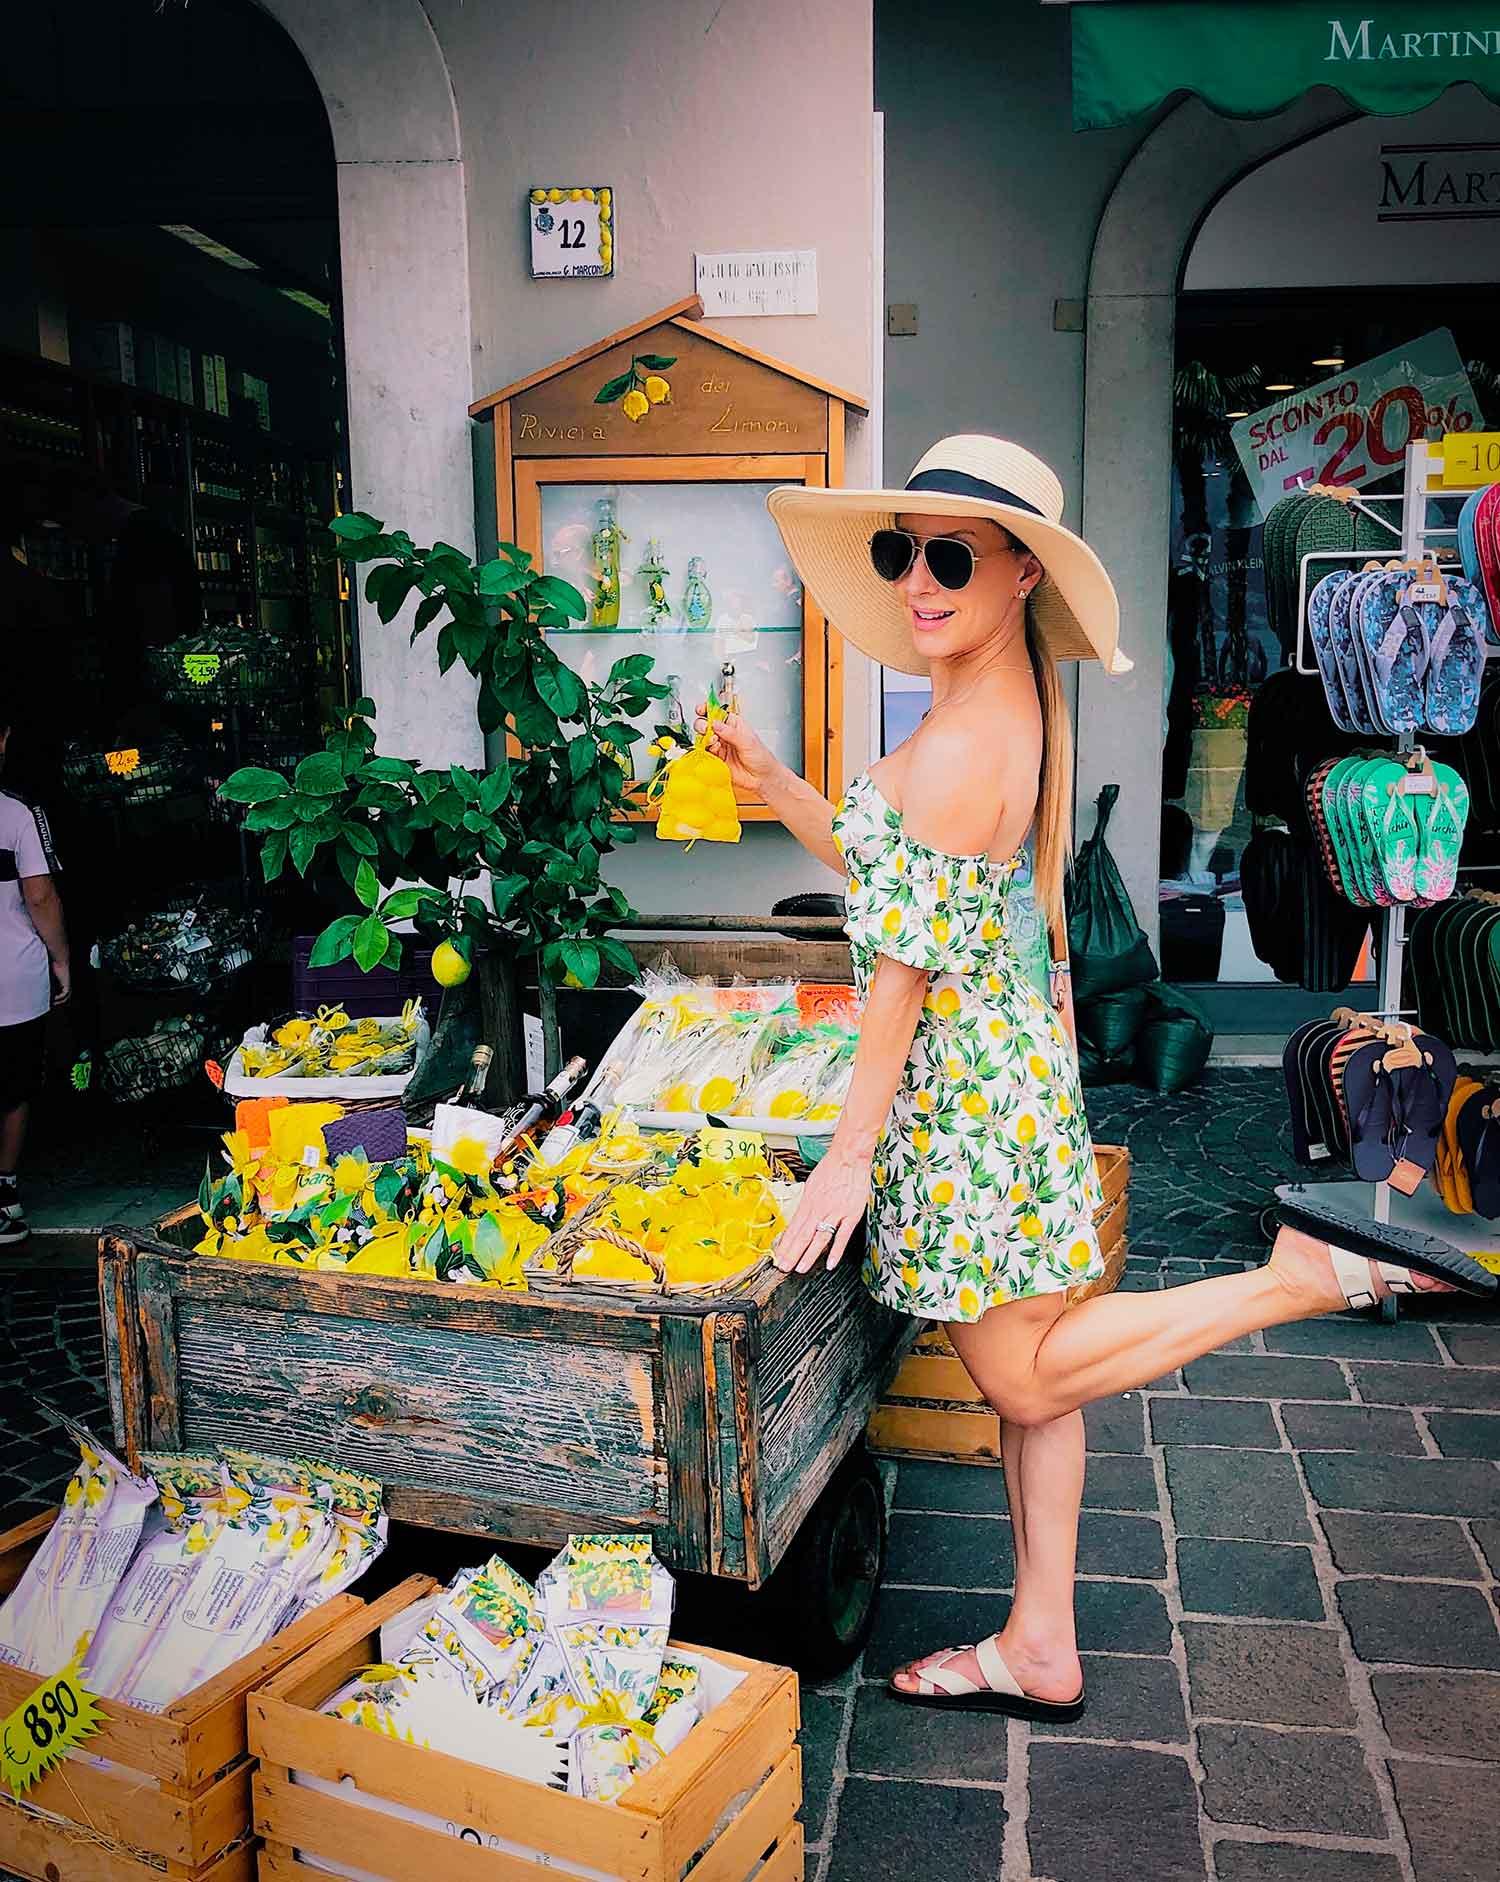 Limone sul garda Italy lemons shop travel blogger eve dawes lemon print dress